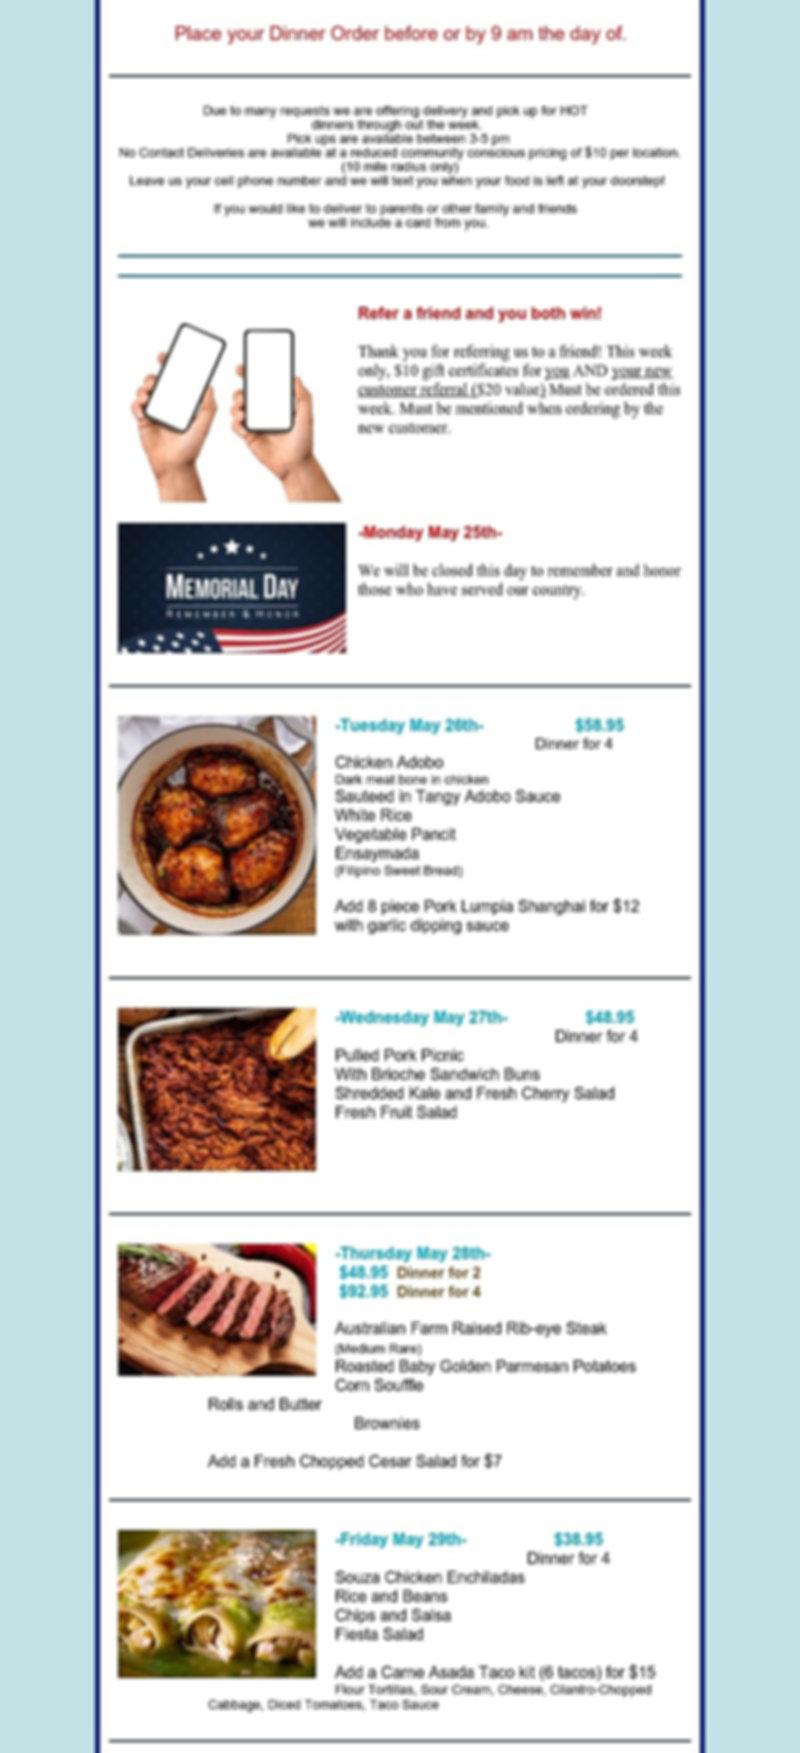 526-529 Dinners.jpg